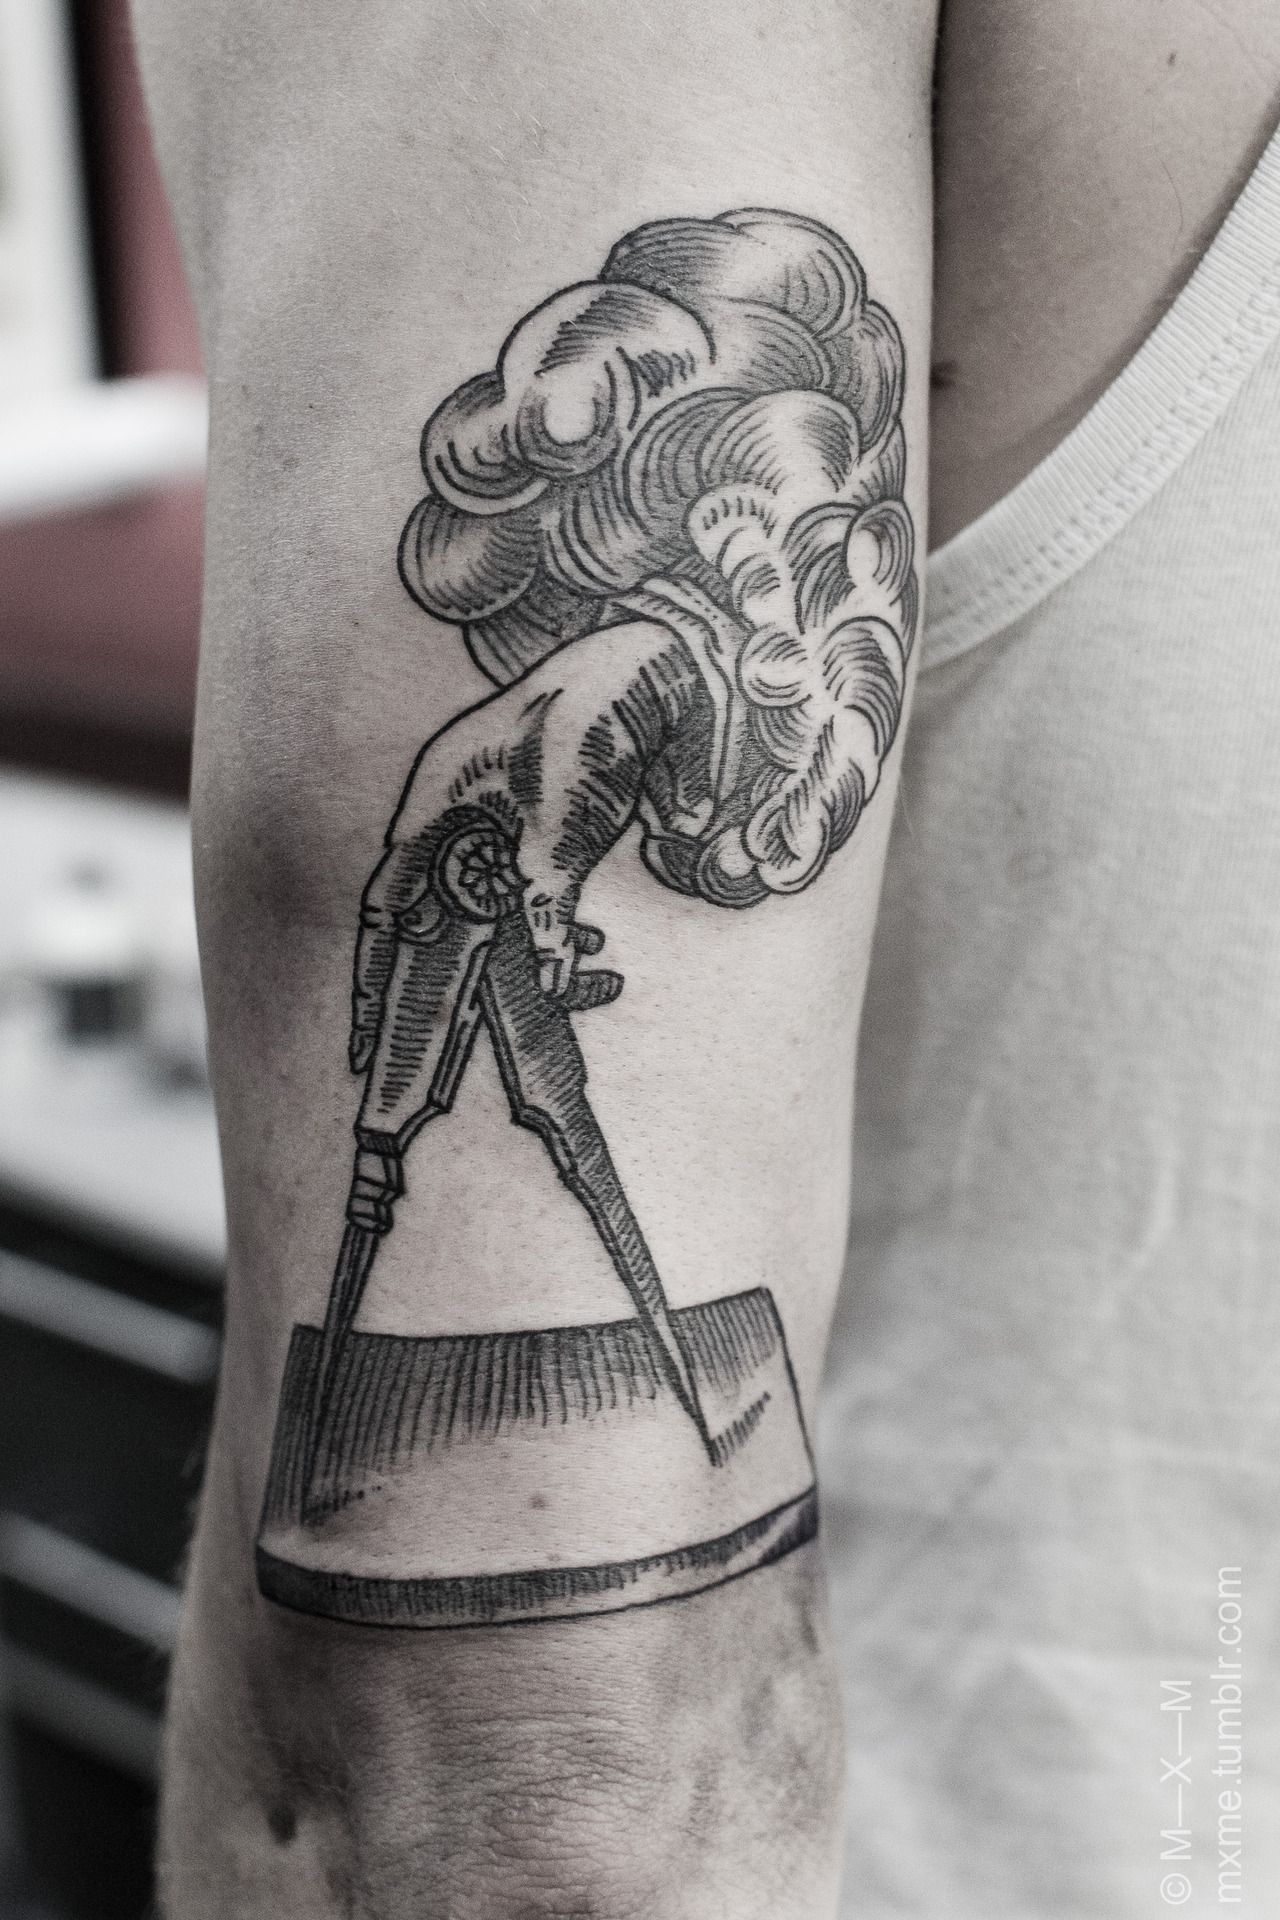 Mxm truly perfect illustration  Tatto  Pinterest  Illustrations